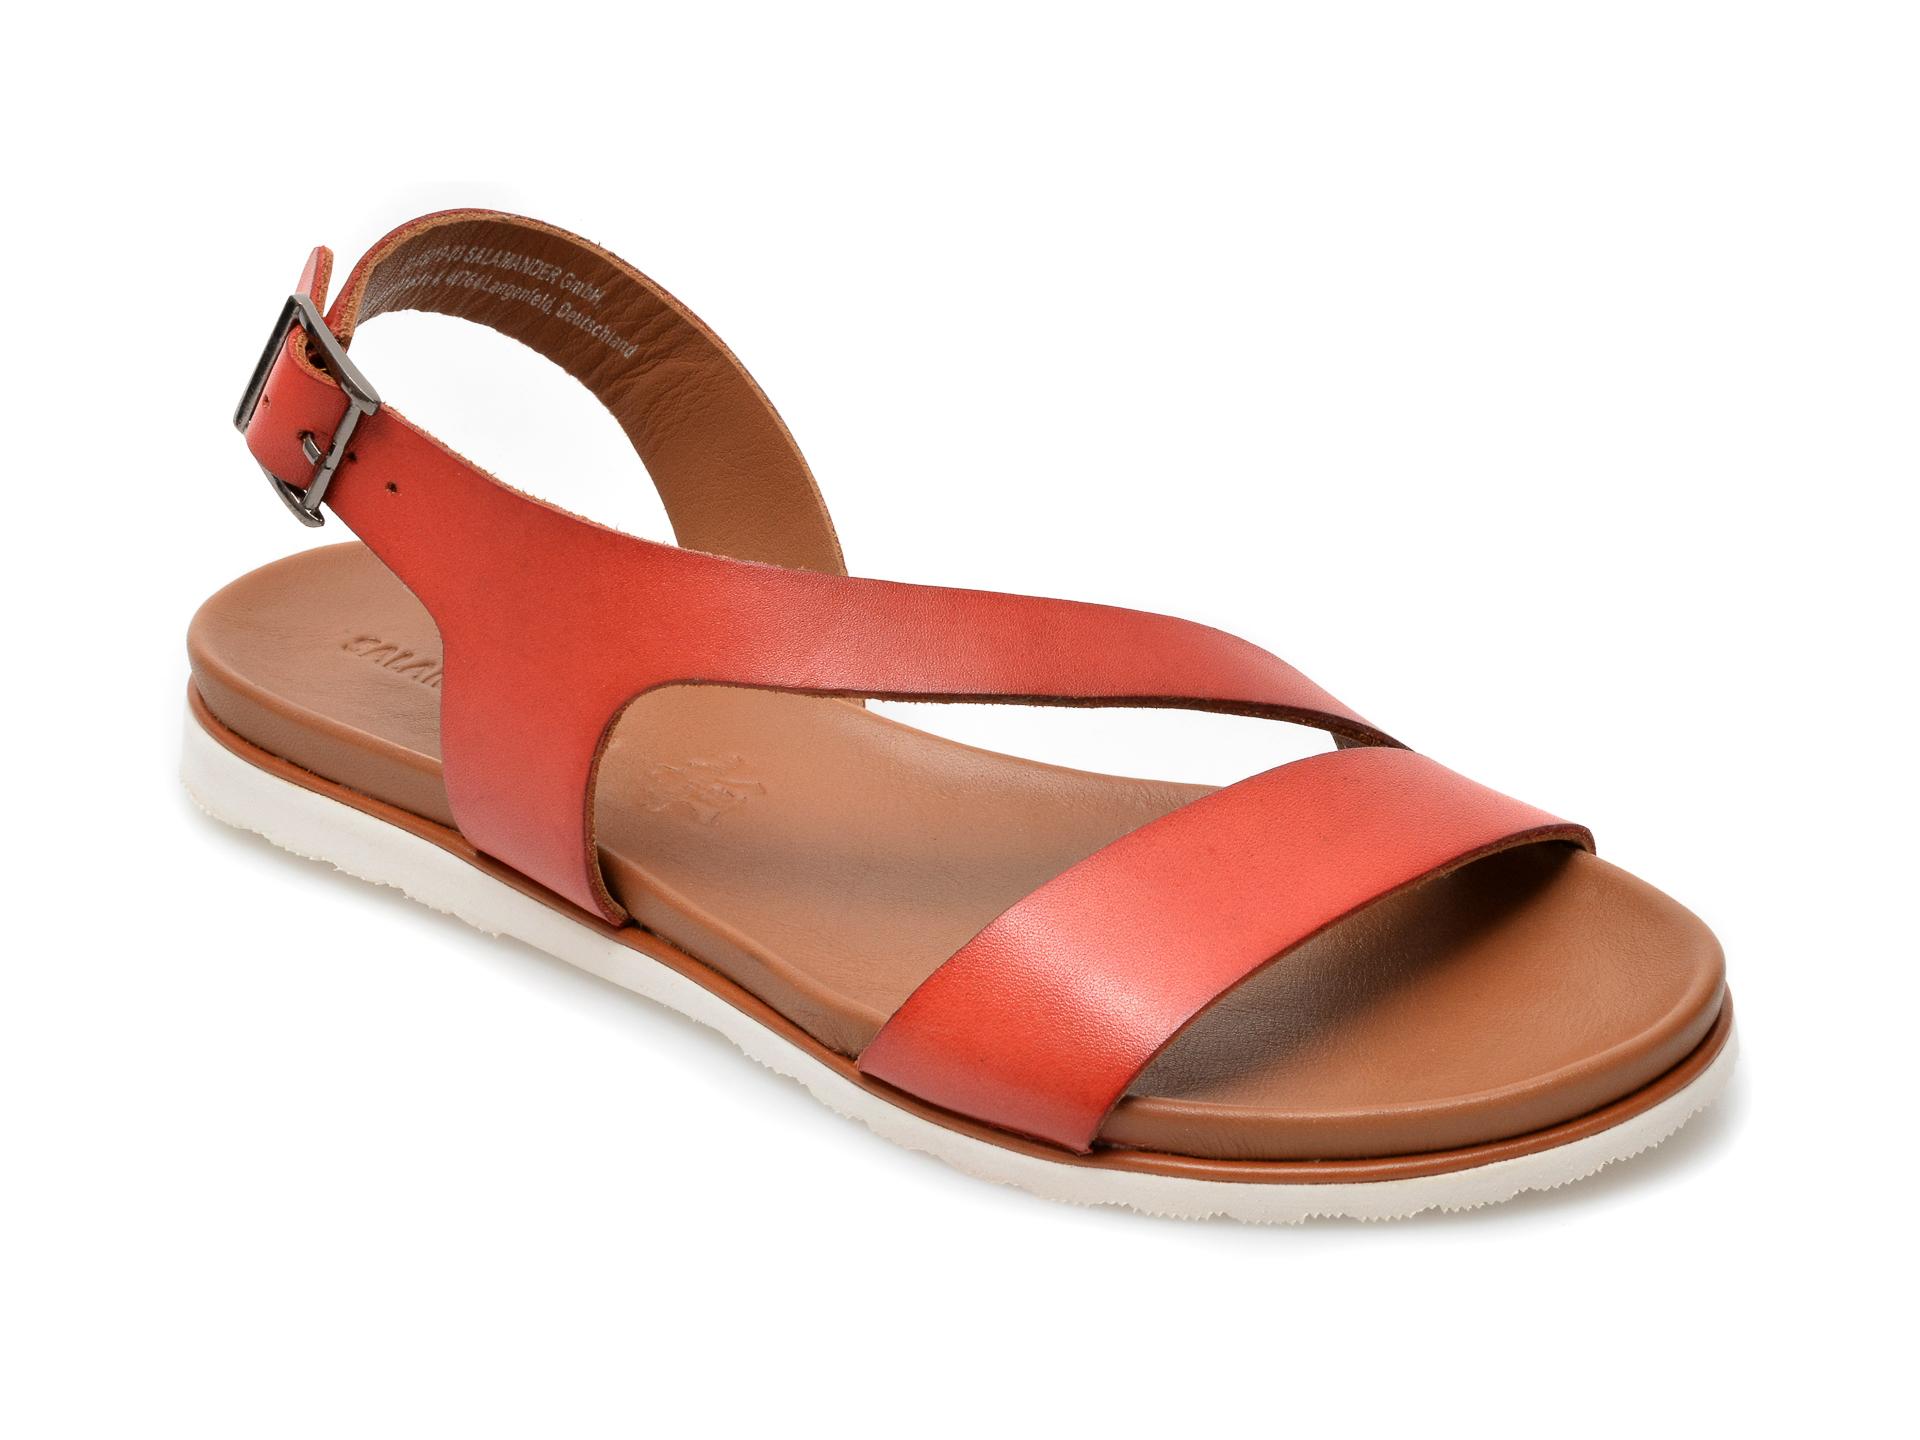 Sandale SALAMANDER rosii, 15019, din piele naturala imagine otter.ro 2021